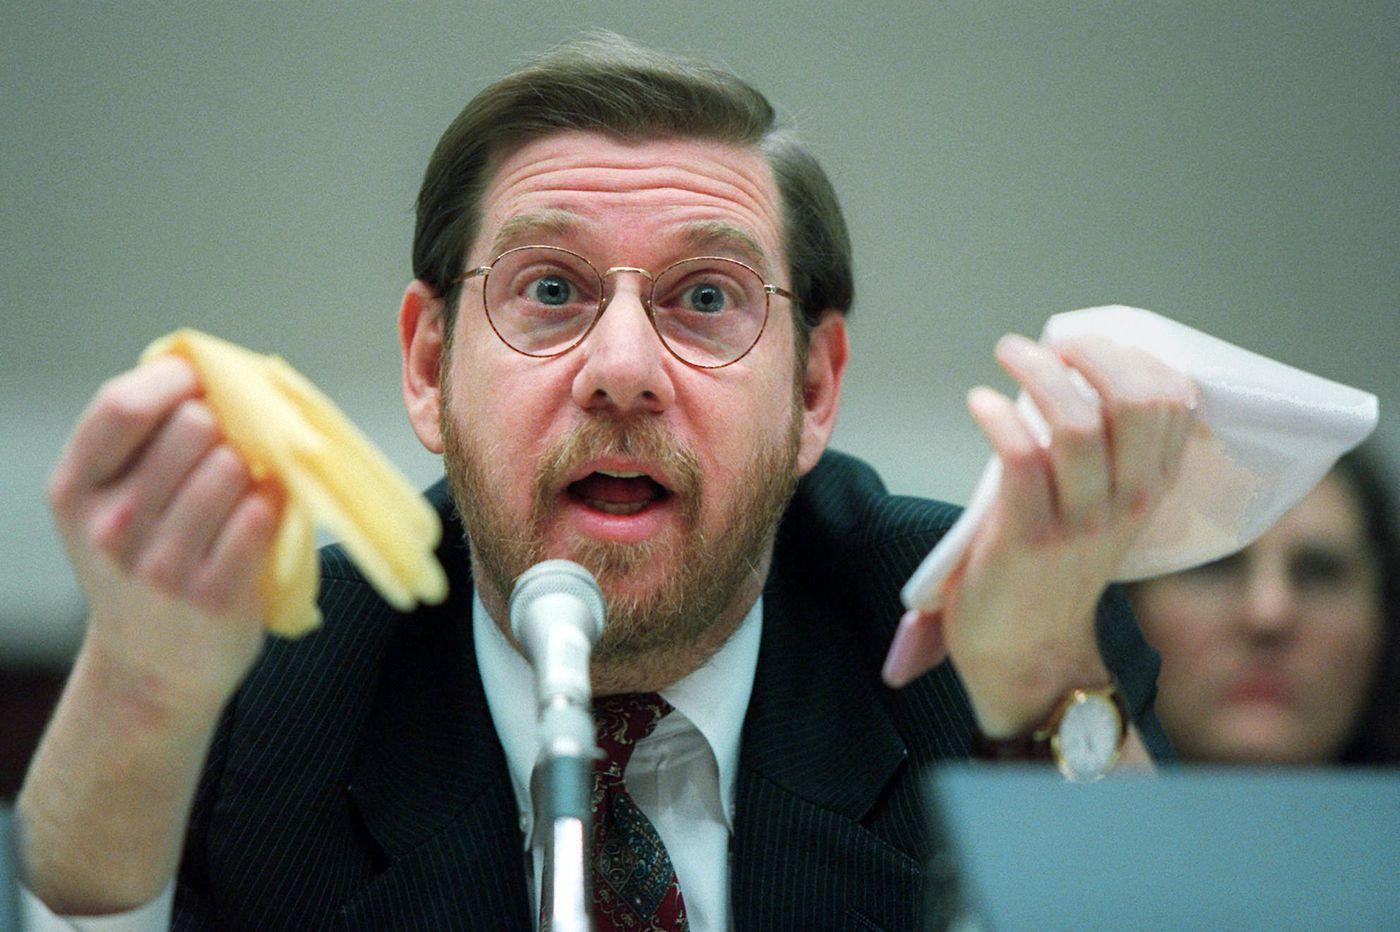 Biden taps former FDA chief Kessler to lead vaccine science